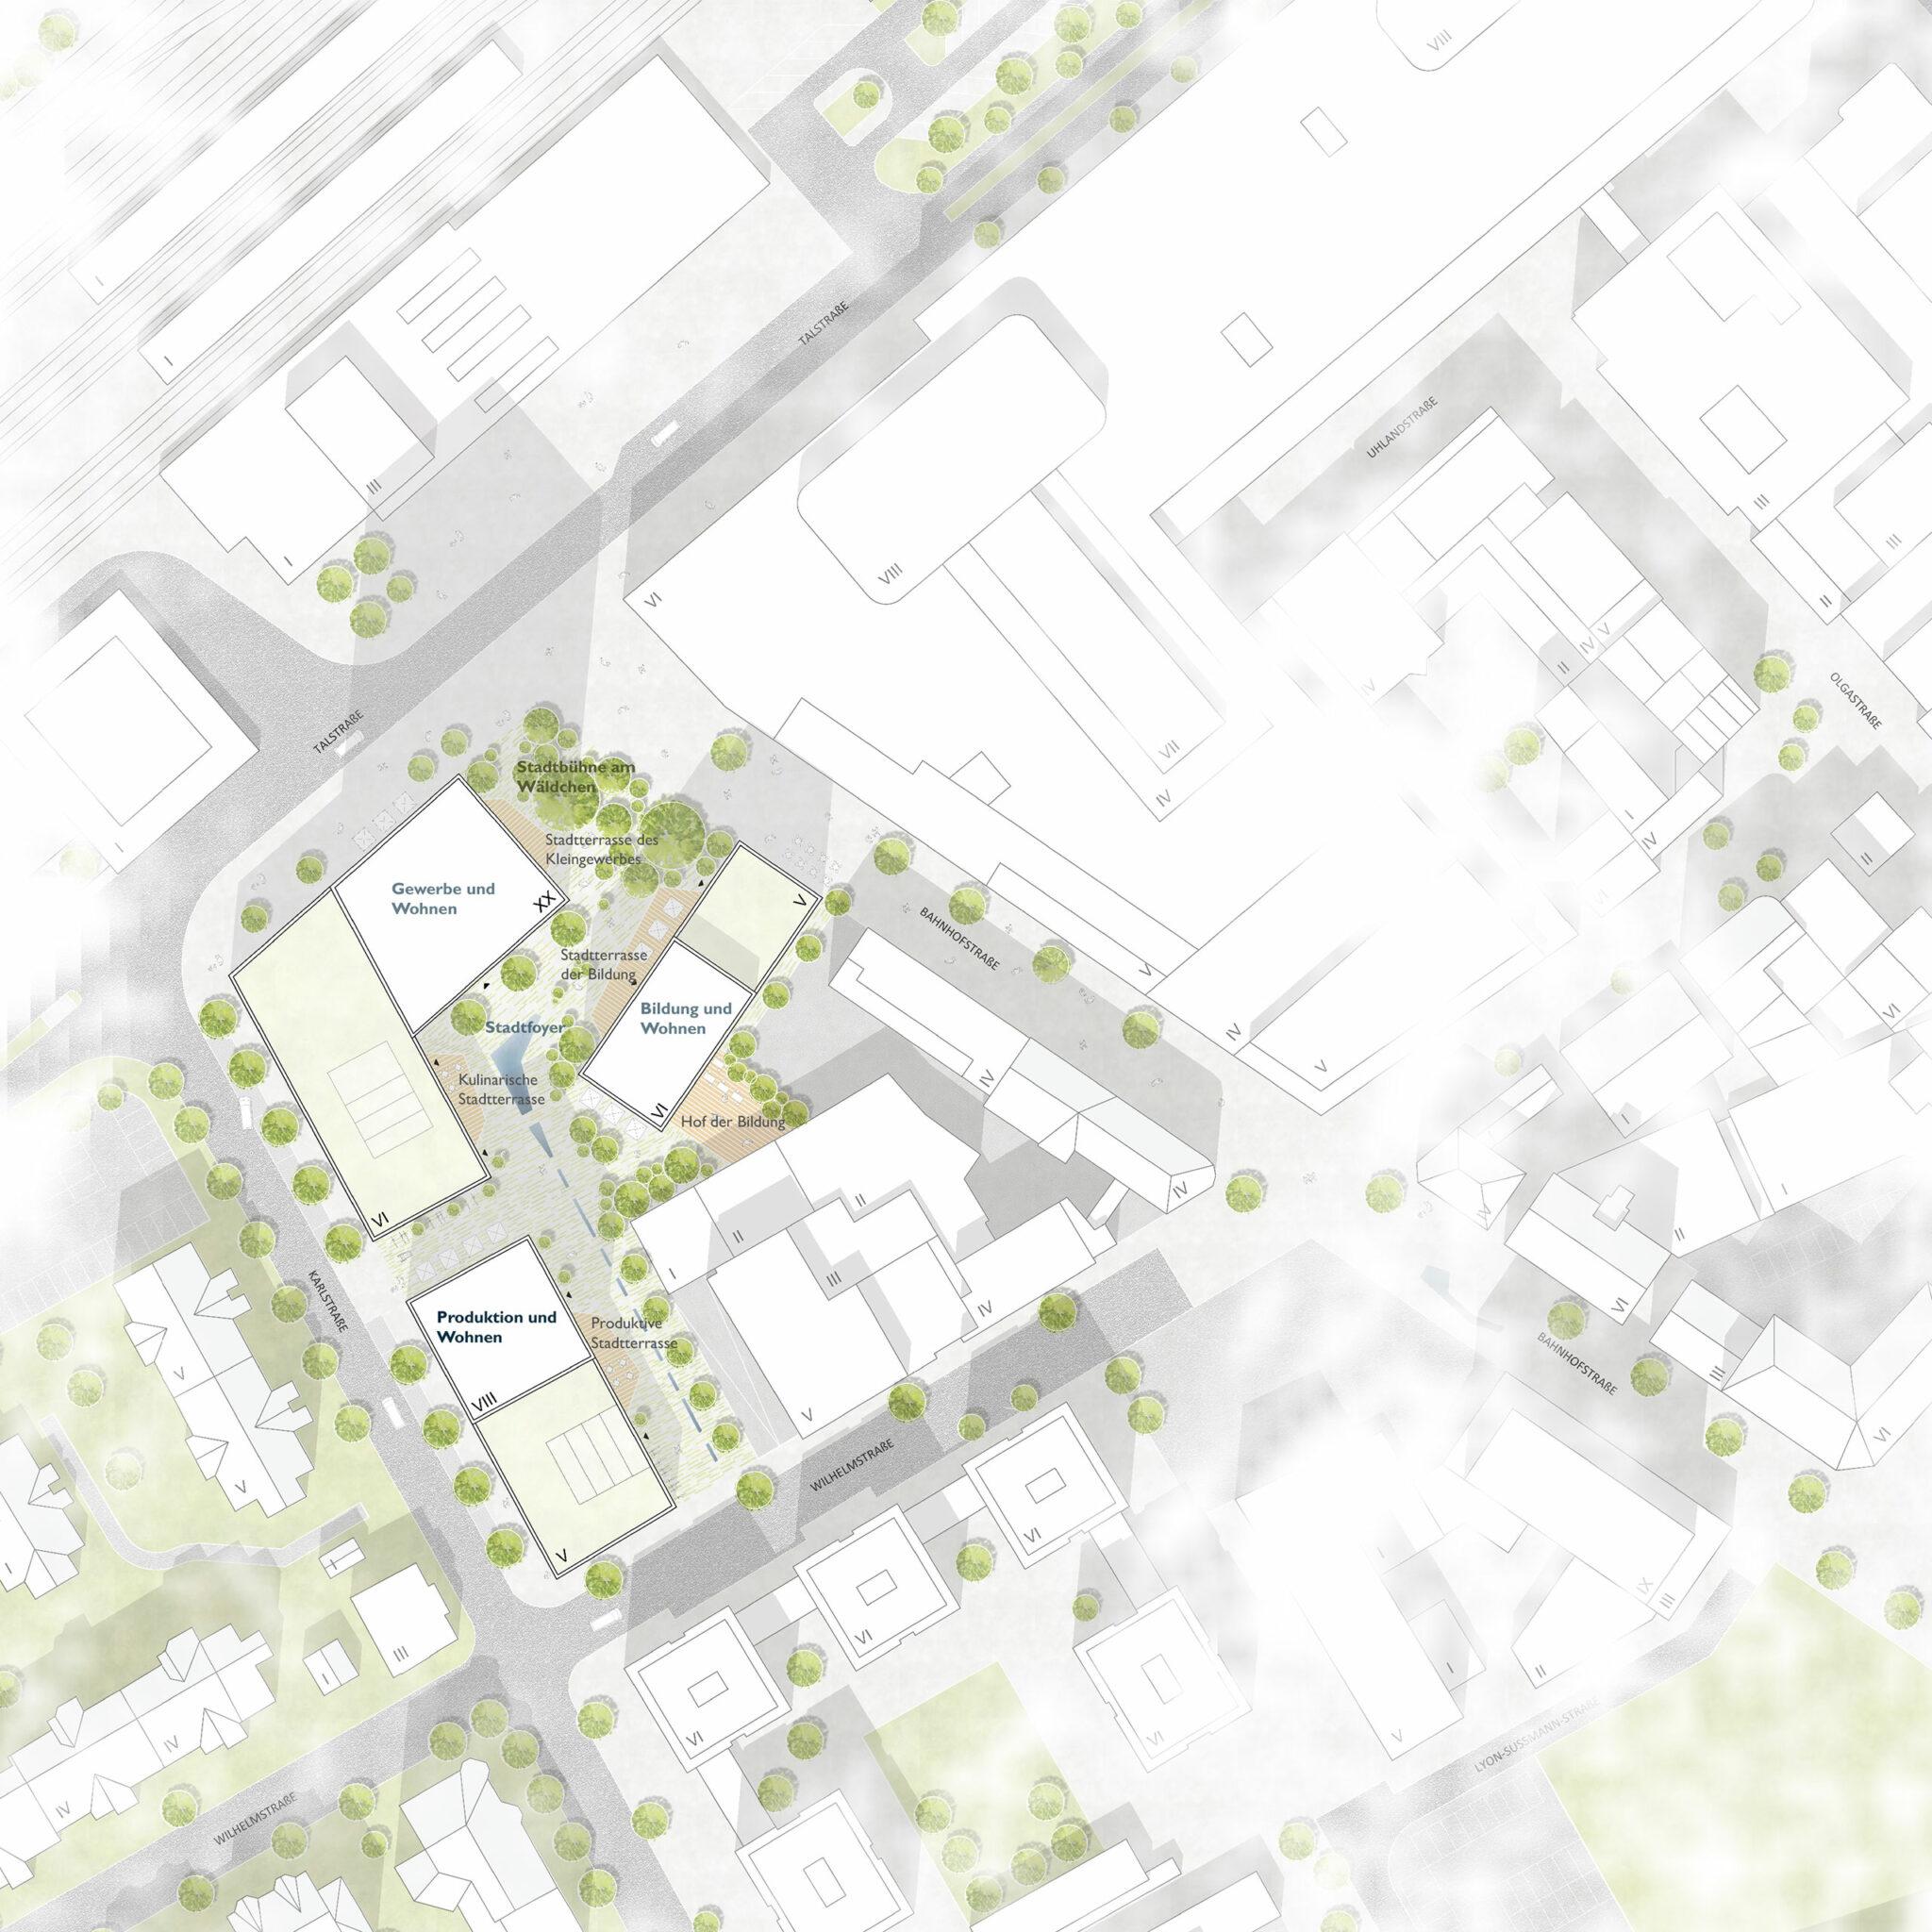 Postareal Böblingen: Site plan of the winning design (Credits: Gutiérrez - De la Fuente Arquitectos / UTA Architekten und Stadtplaner)